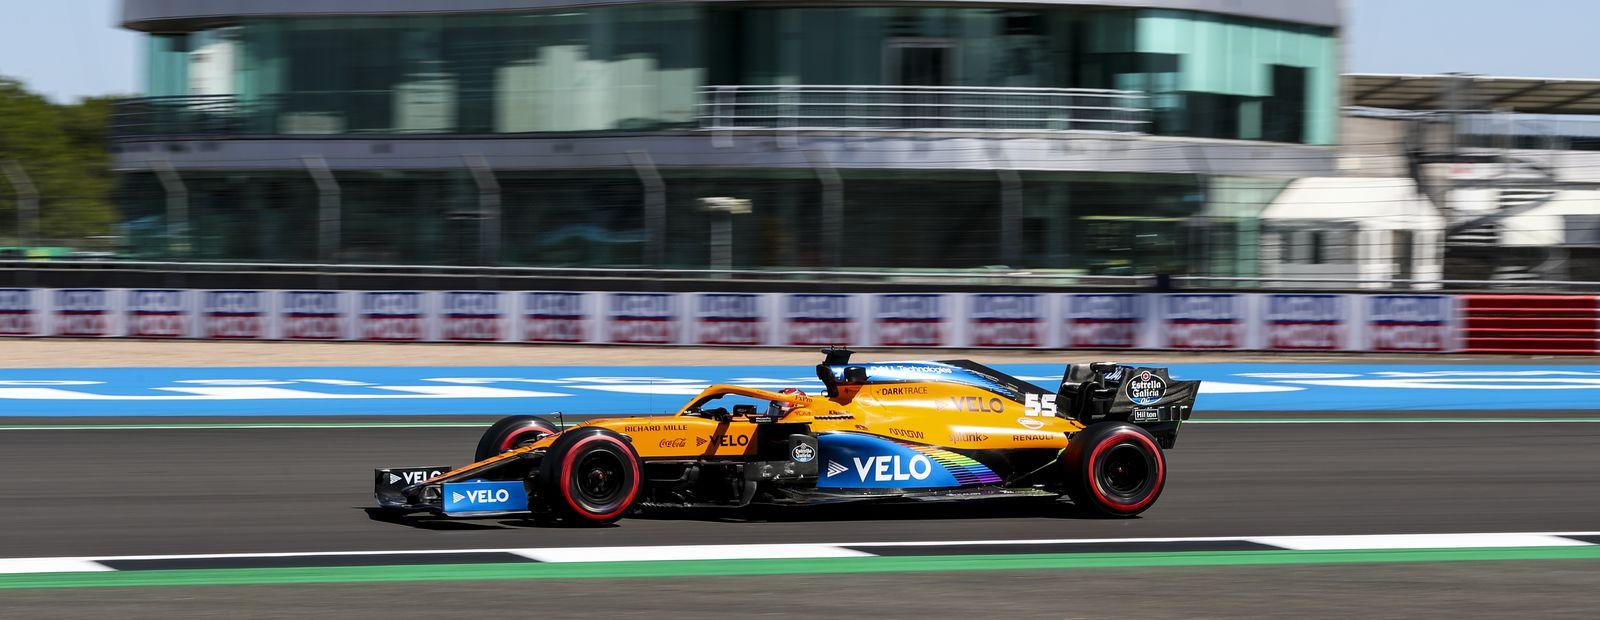 2020 70th Anniversary Grand Prix – Free Practice